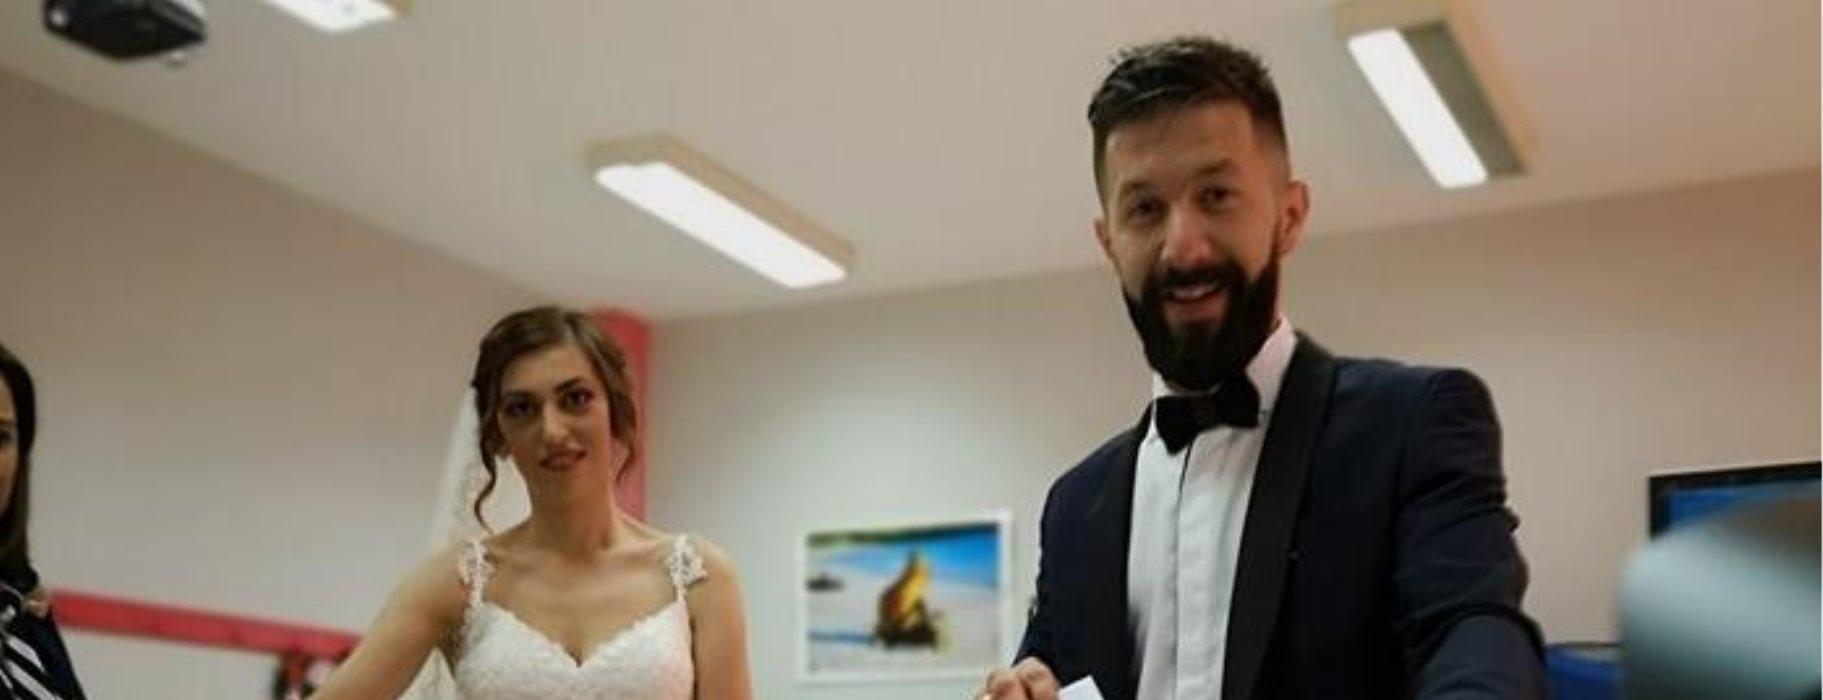 216a5214bd88 Παντρεύτηκαν και πήγαν να ψηφίσουν με το νυφικό και το γαμπριάτικο